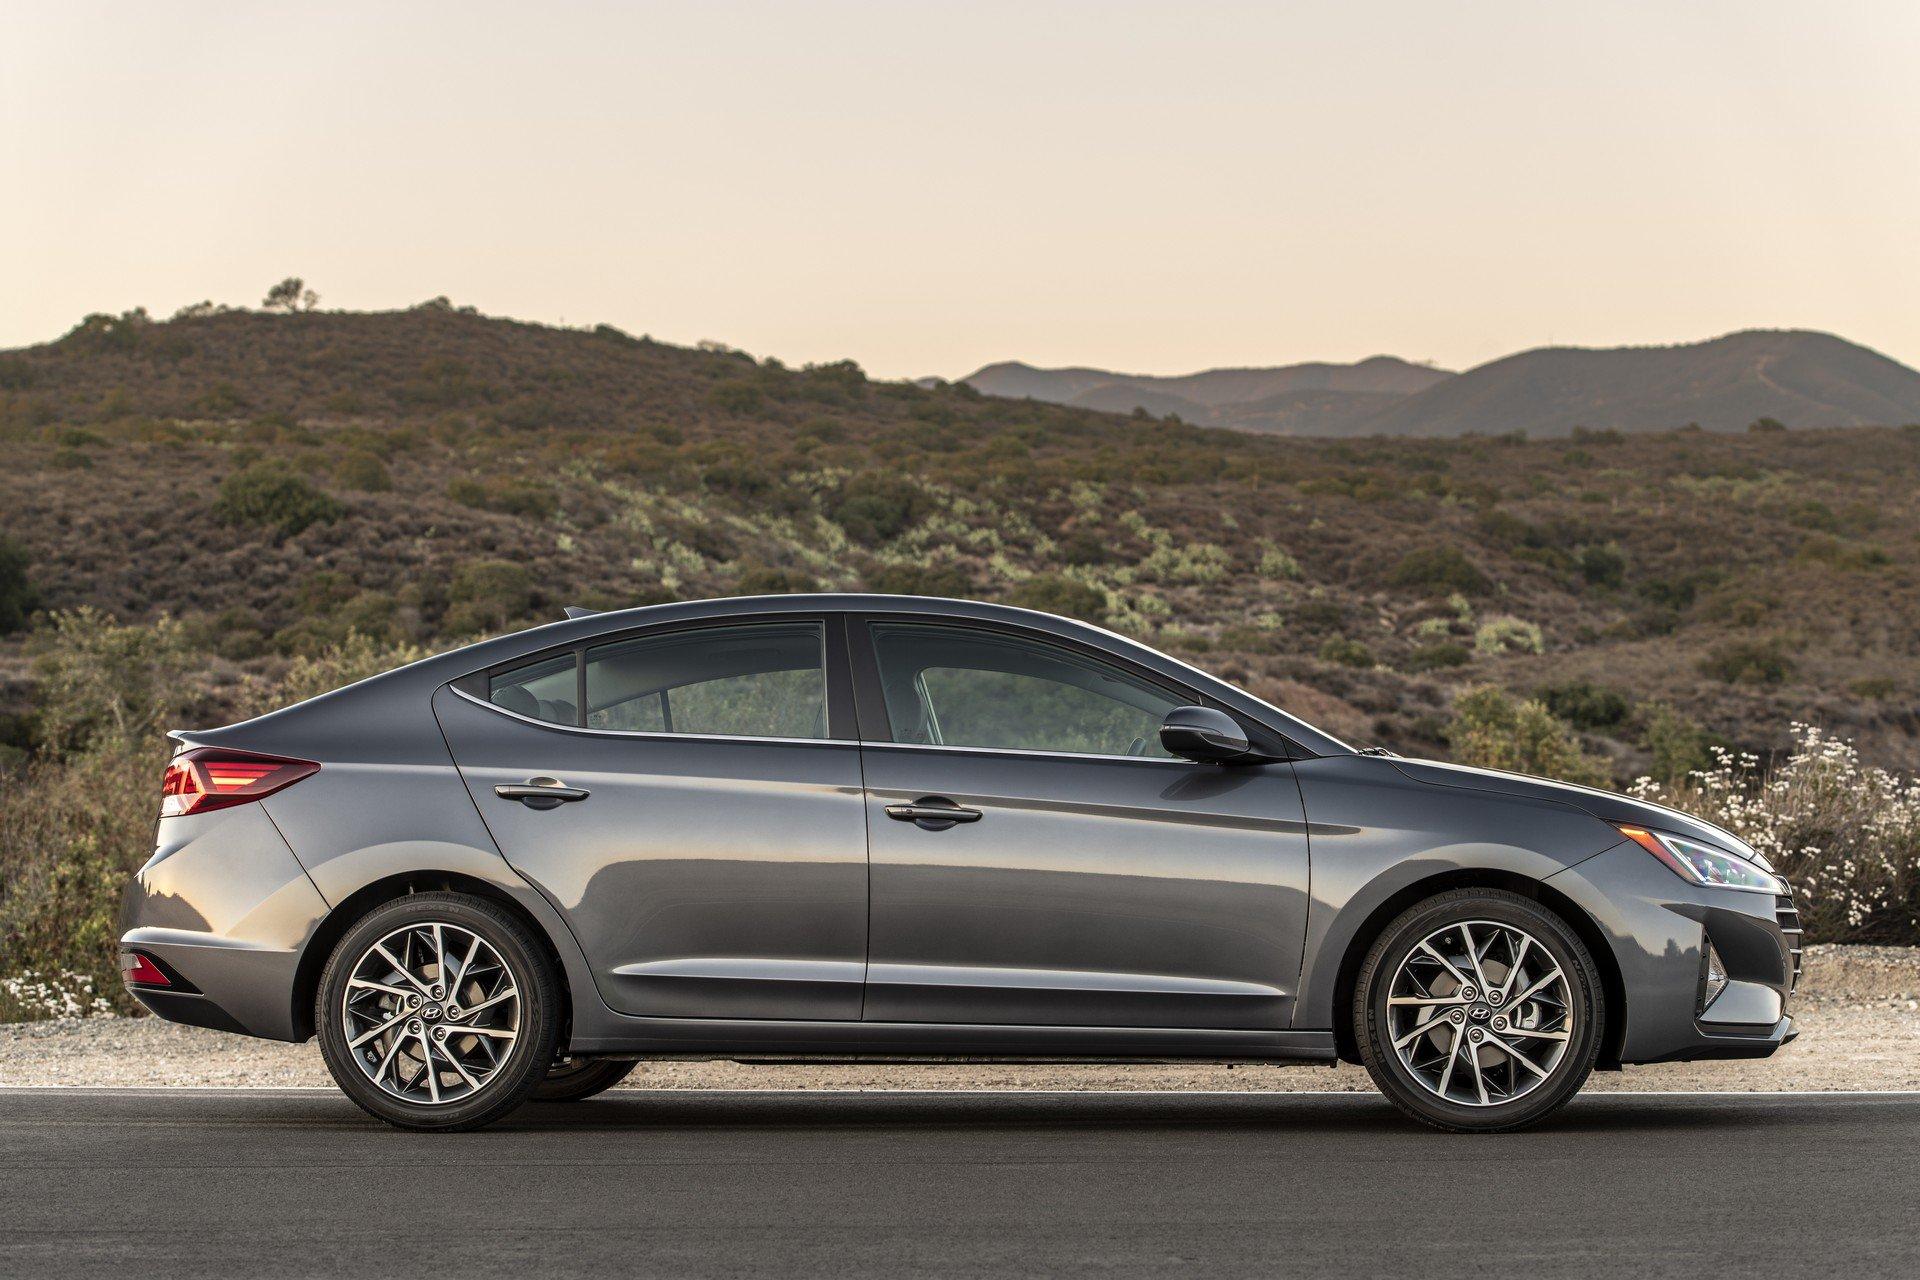 Hyundai Elantra 2019 (6)